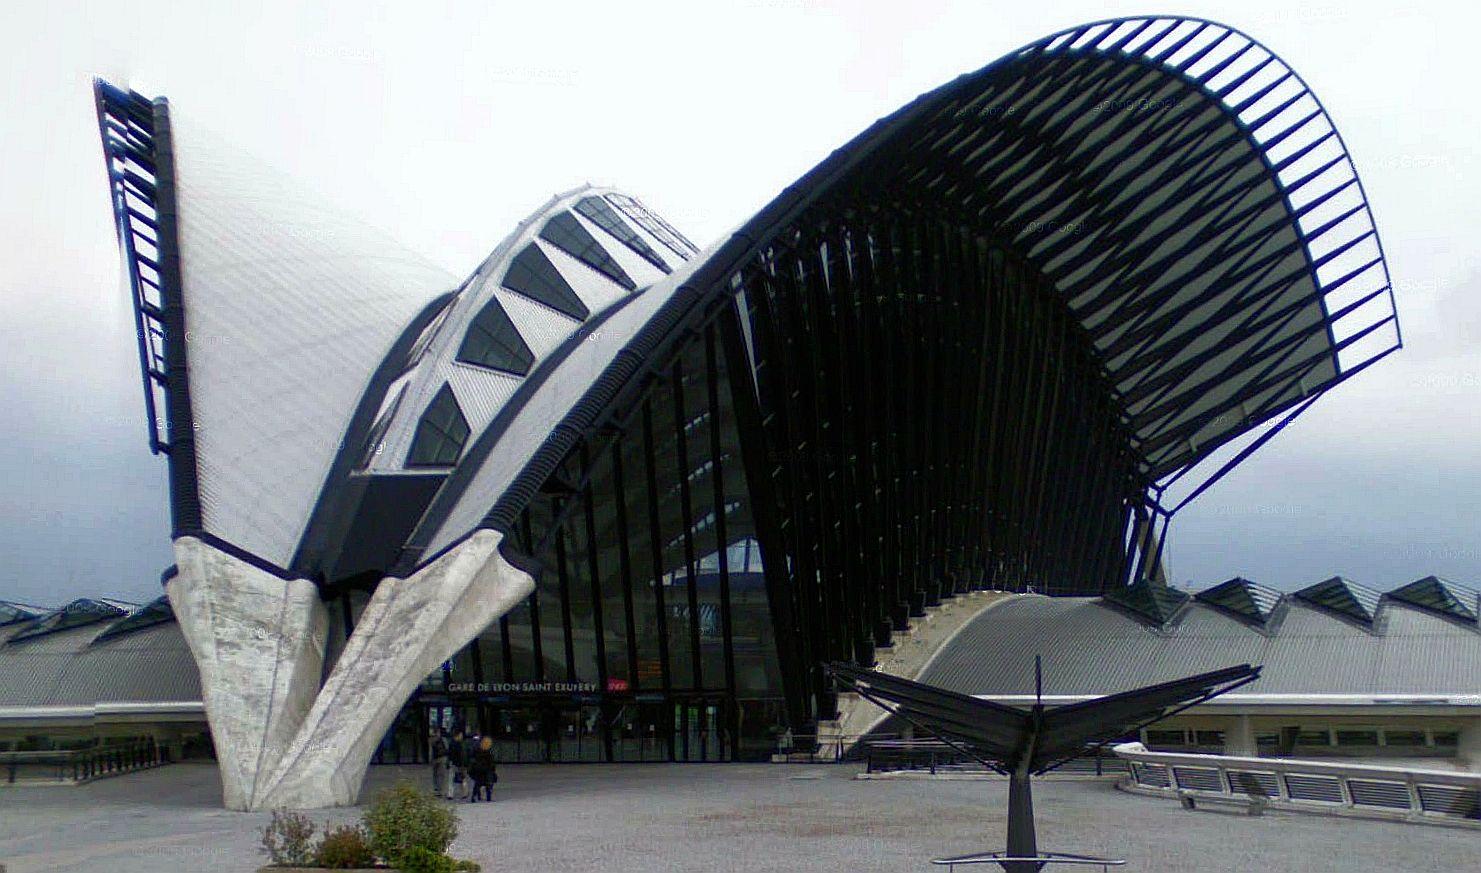 Aeroport de Lyon-Saint Exupéry Airport,  Lyon, France